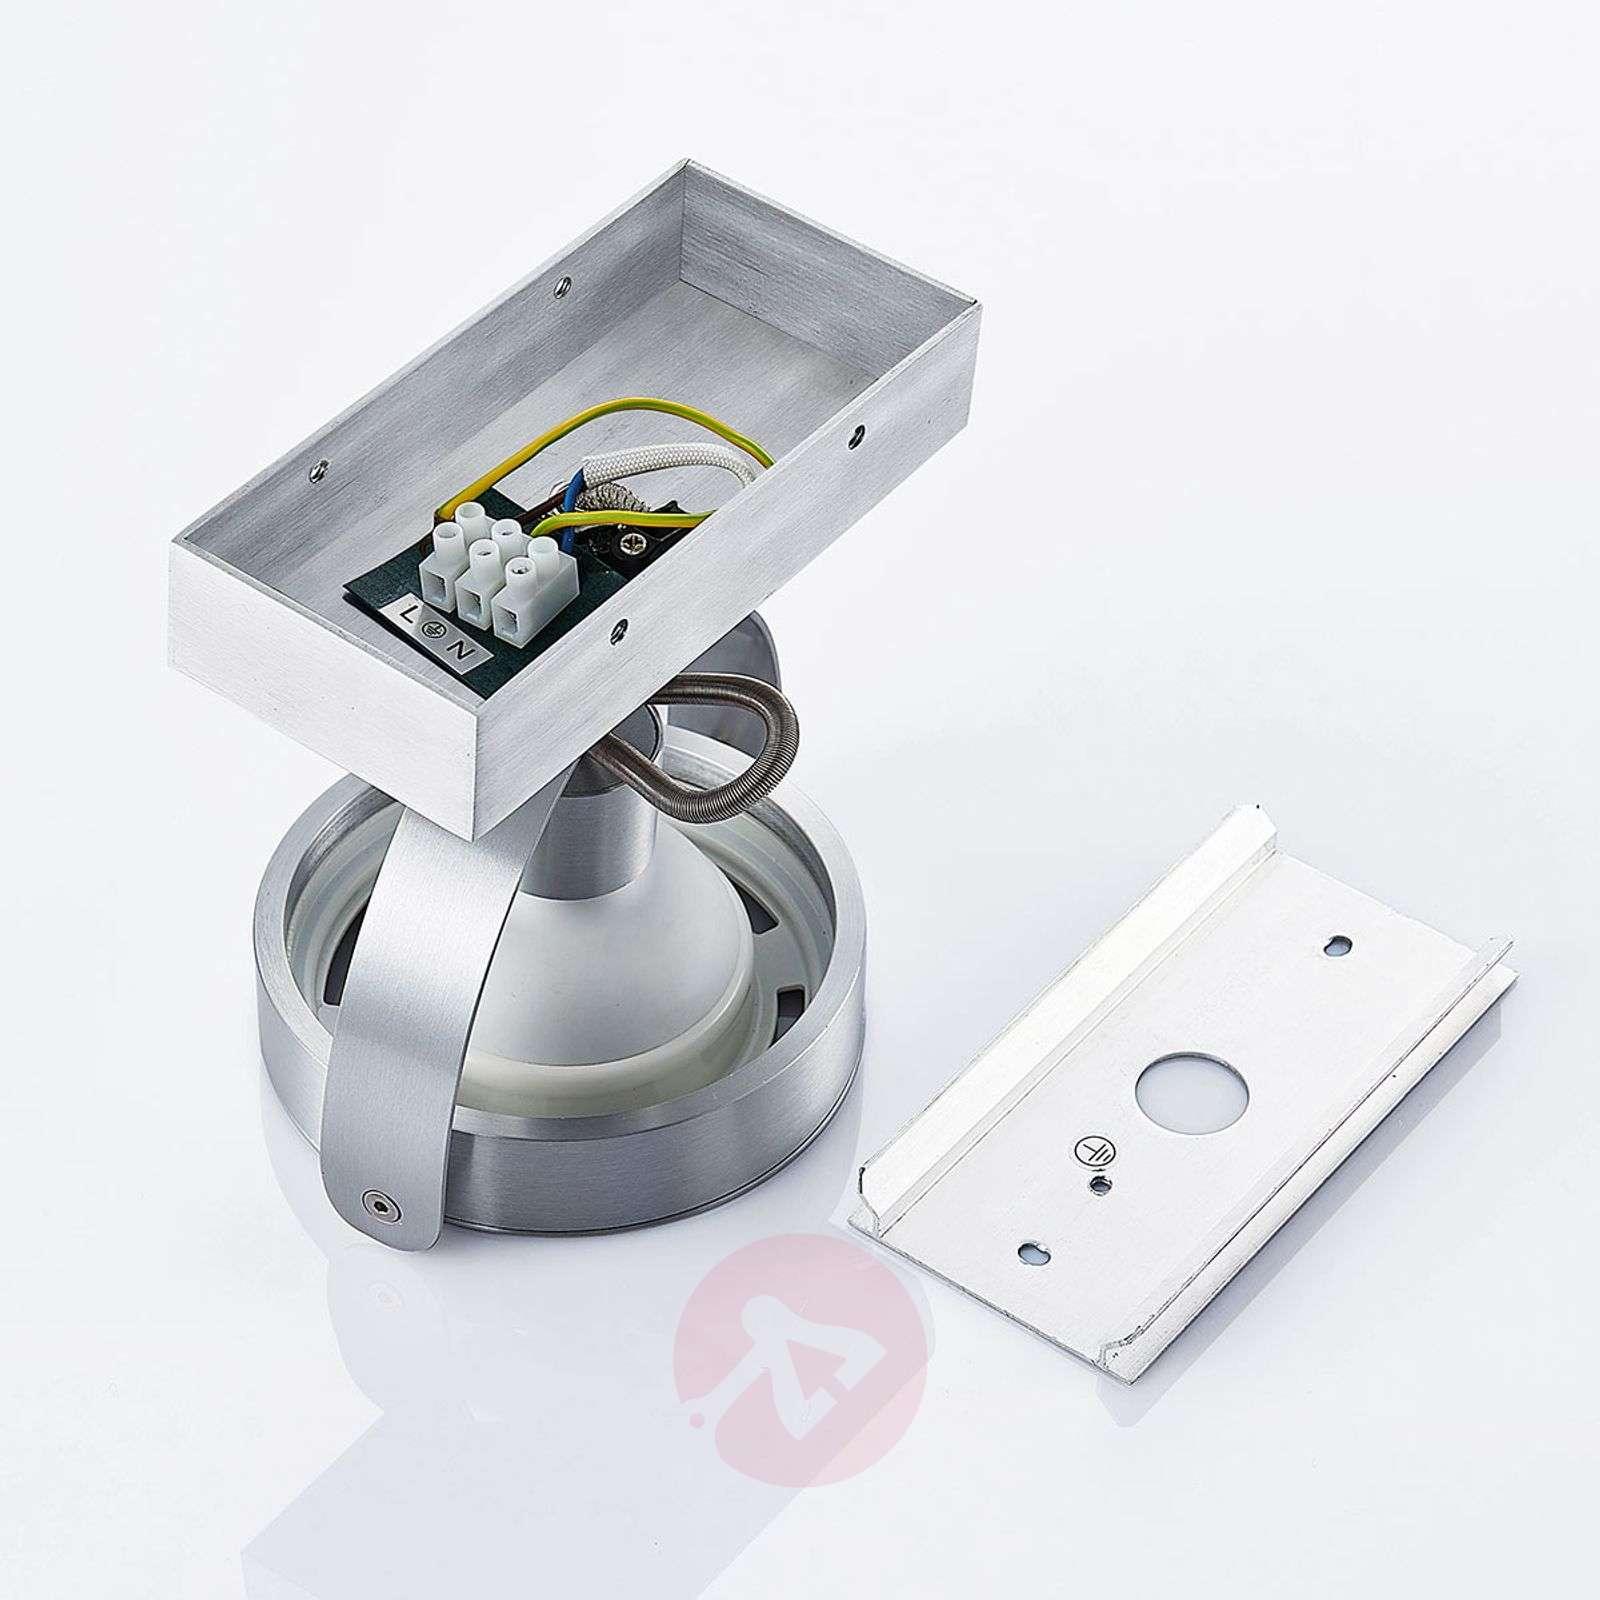 Munin alumiini-kohdevalaisin LED-lampulla-9621876-03